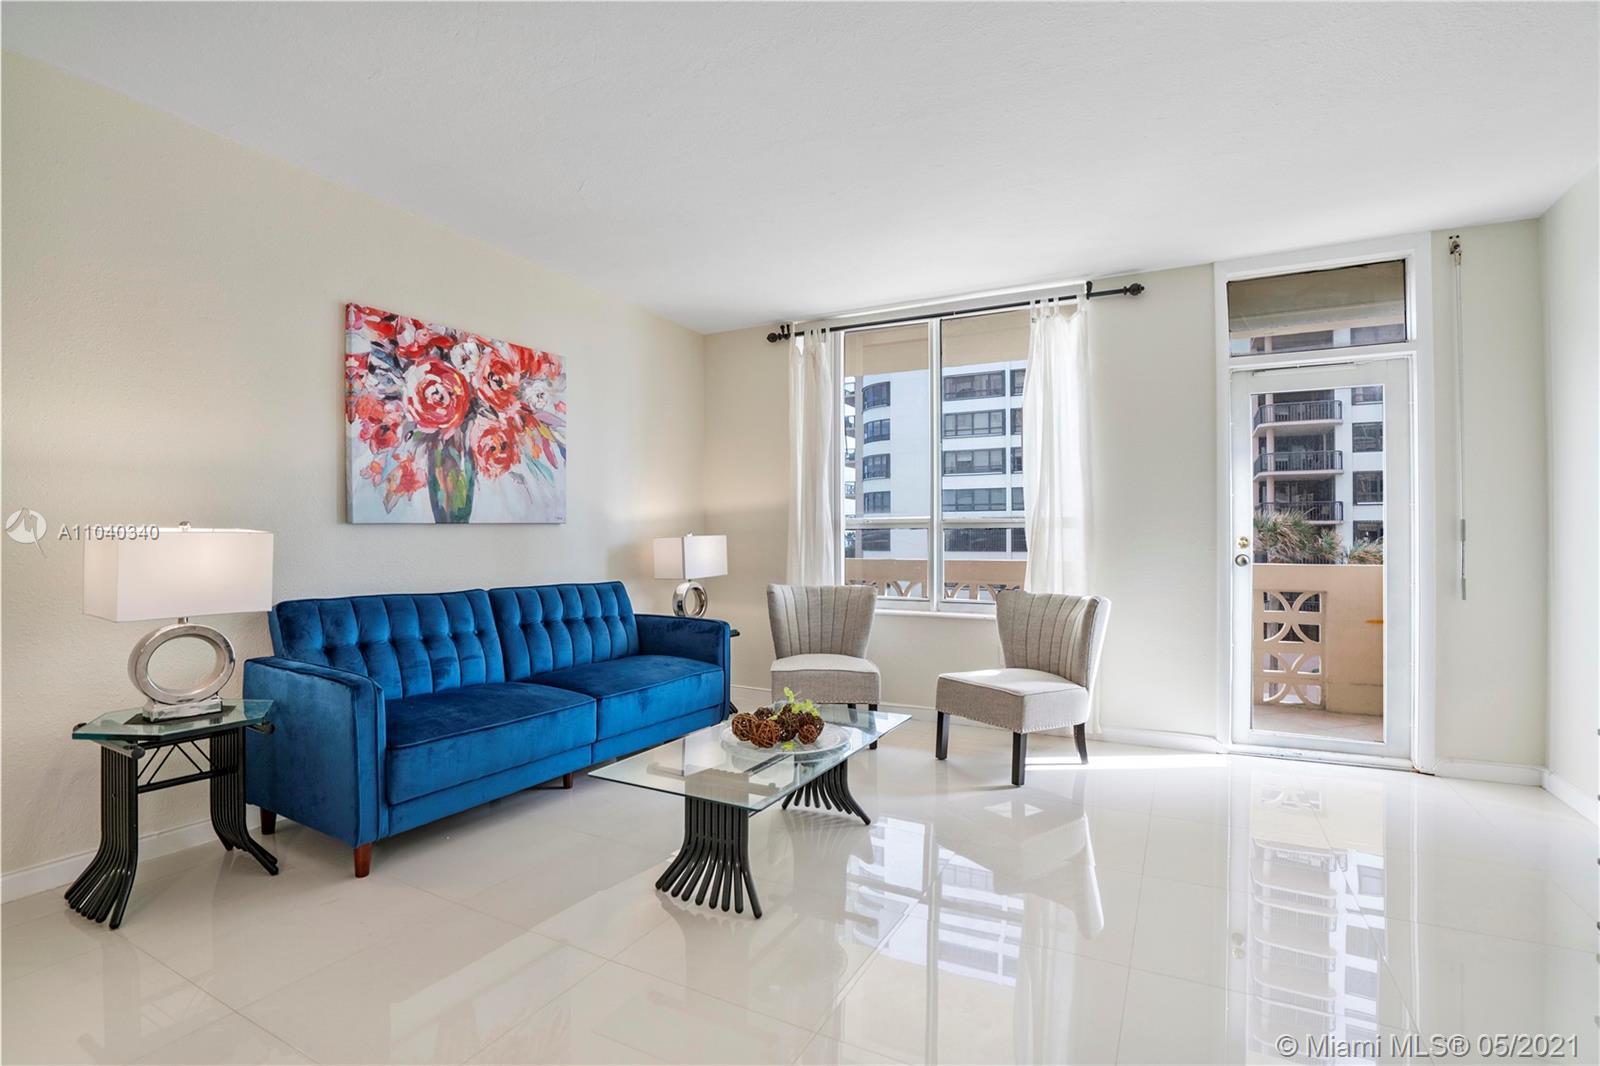 Bal Harbour best!!!!Oceanview 1 Bedroom 1 Bath remodeled, rented for $1,800 .00 per month until Octo